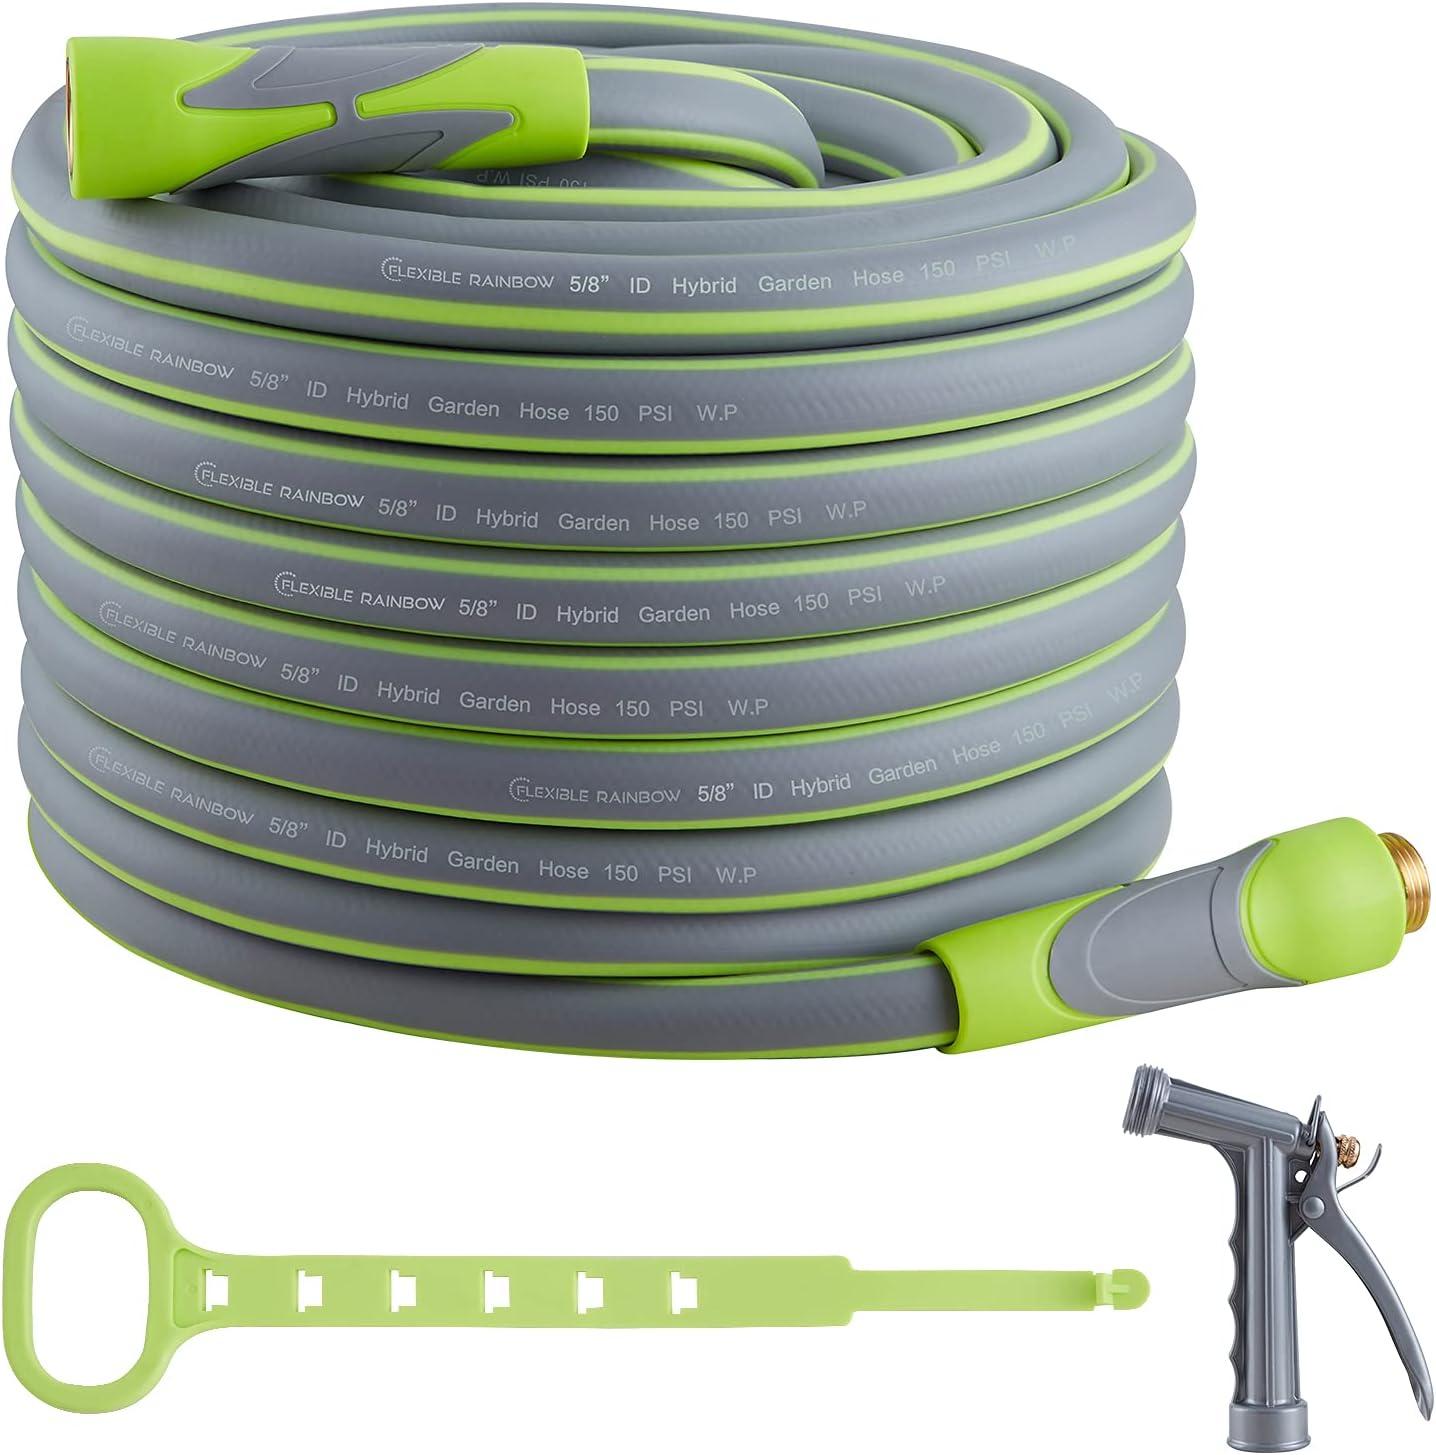 Garden Hose, Hybrid 5/8 in, Heavy Duty, Light Weight and Flexible Water Hose (Green, 100' (feet))